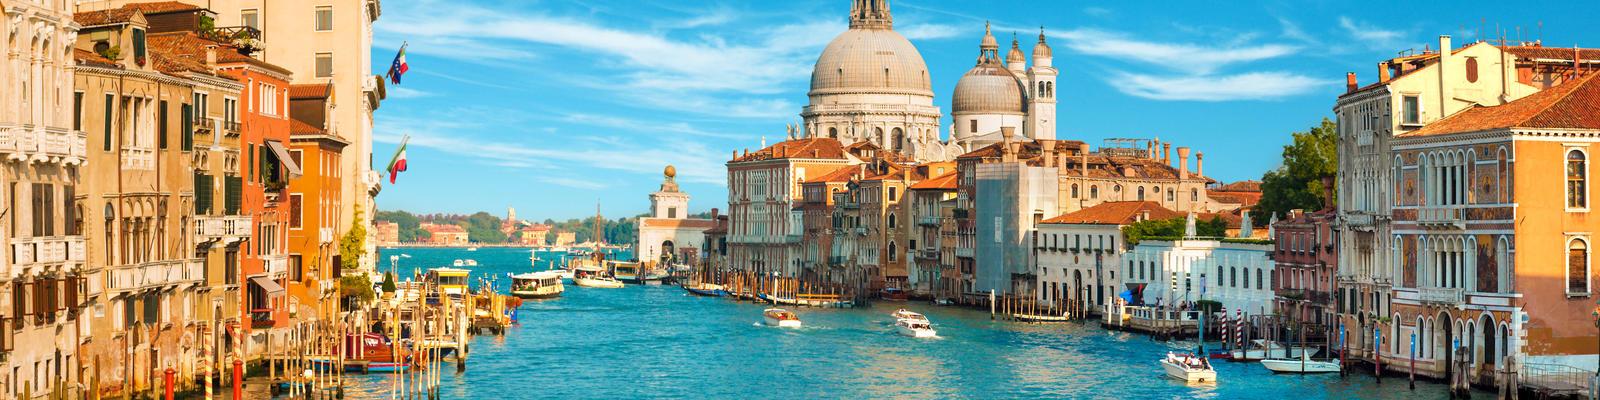 Venice, Italy (Photo: Gurgen Bakhshetyan/Shutterstock)